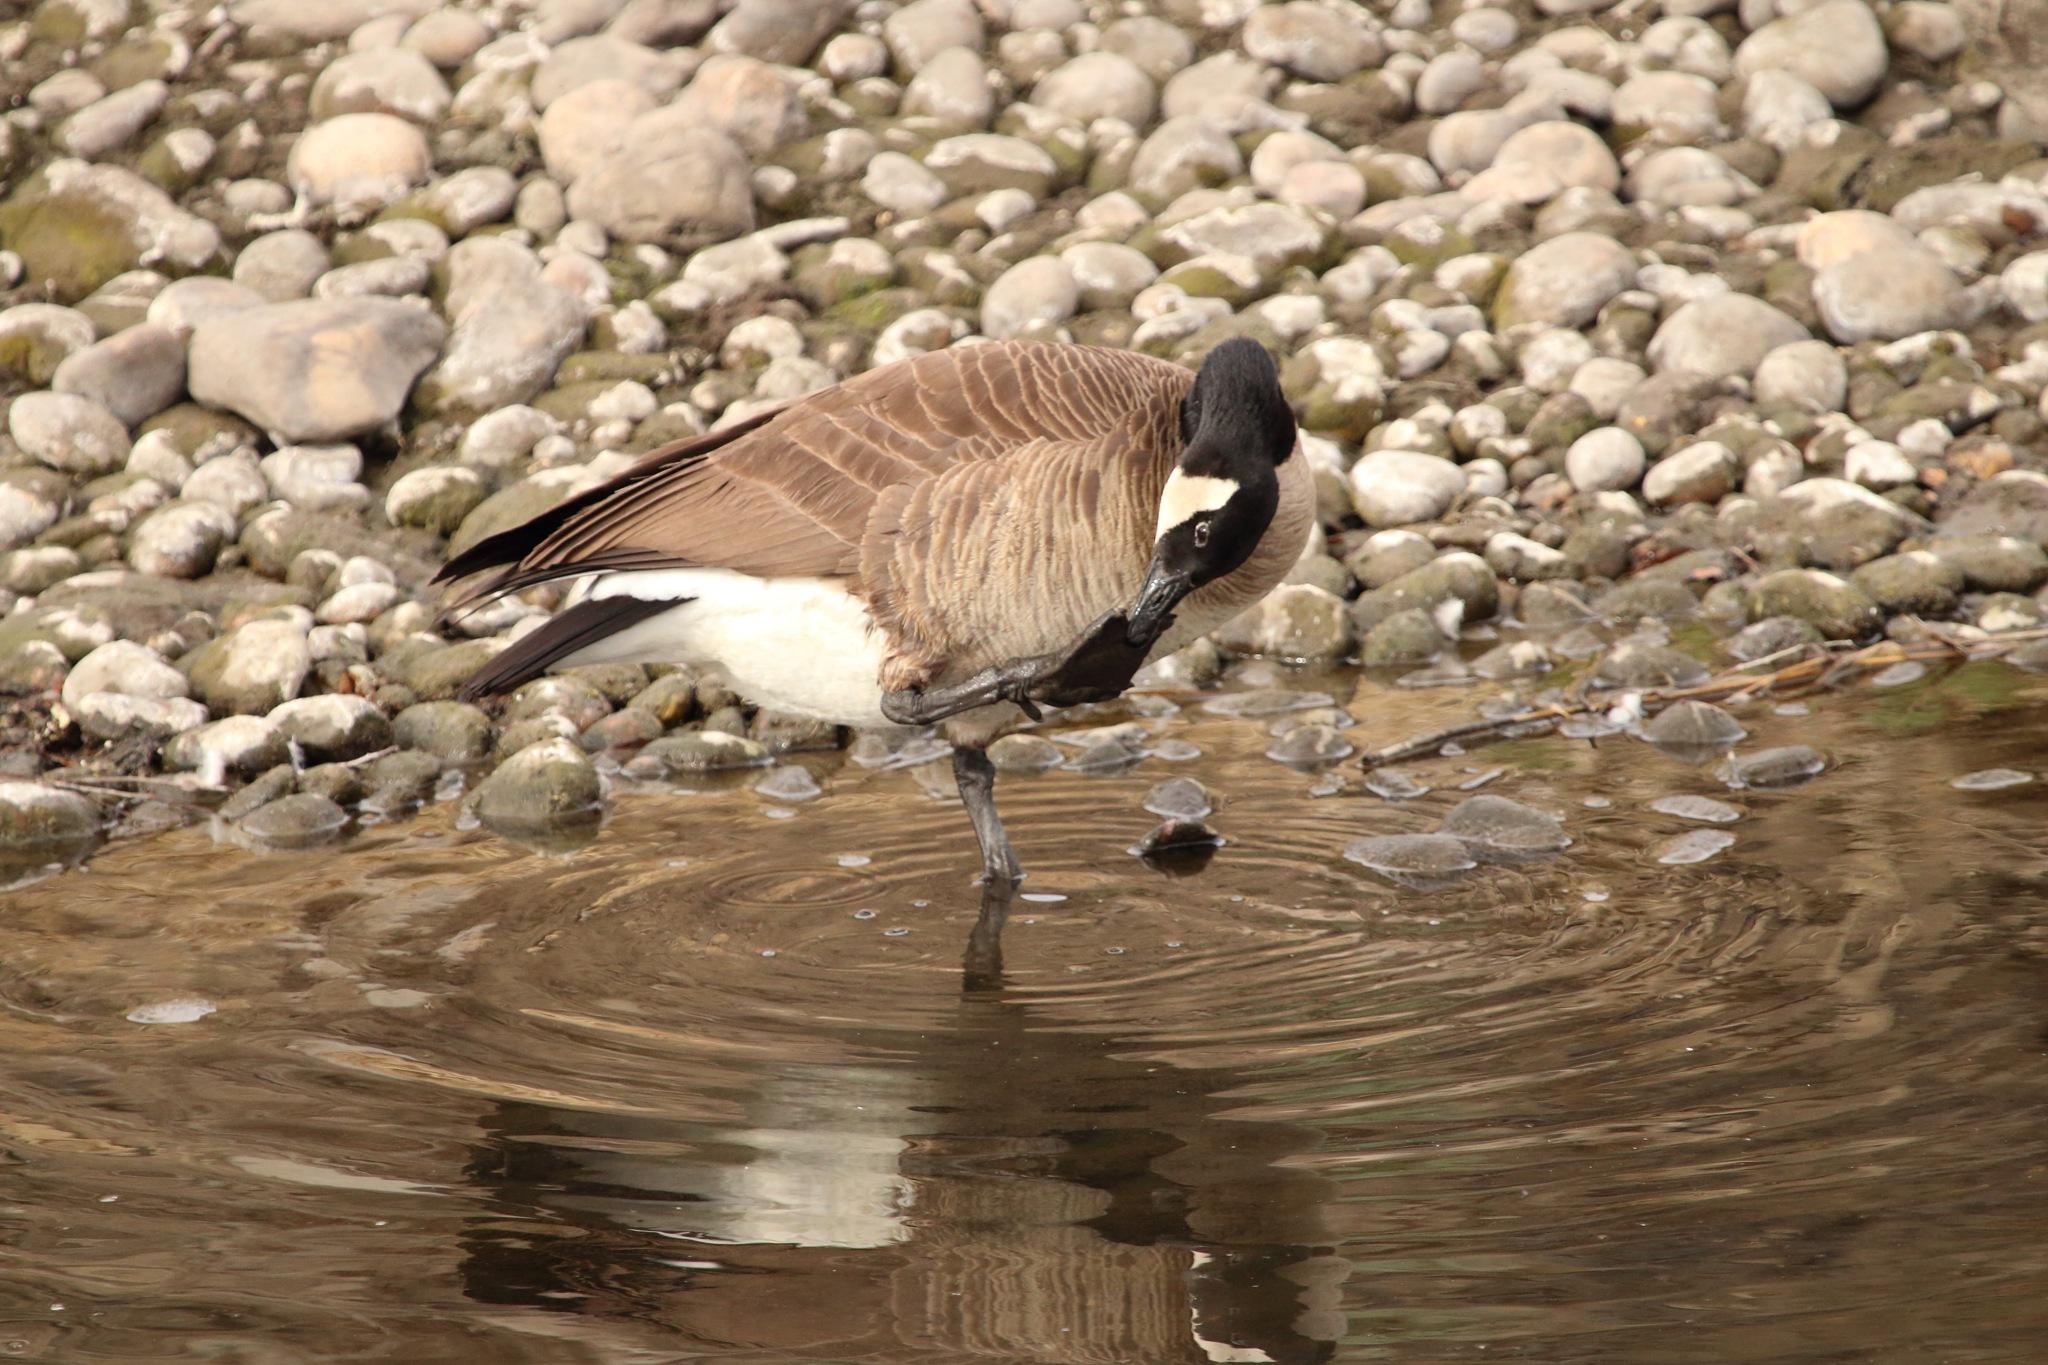 Canada Goose by daniel.luna.77920